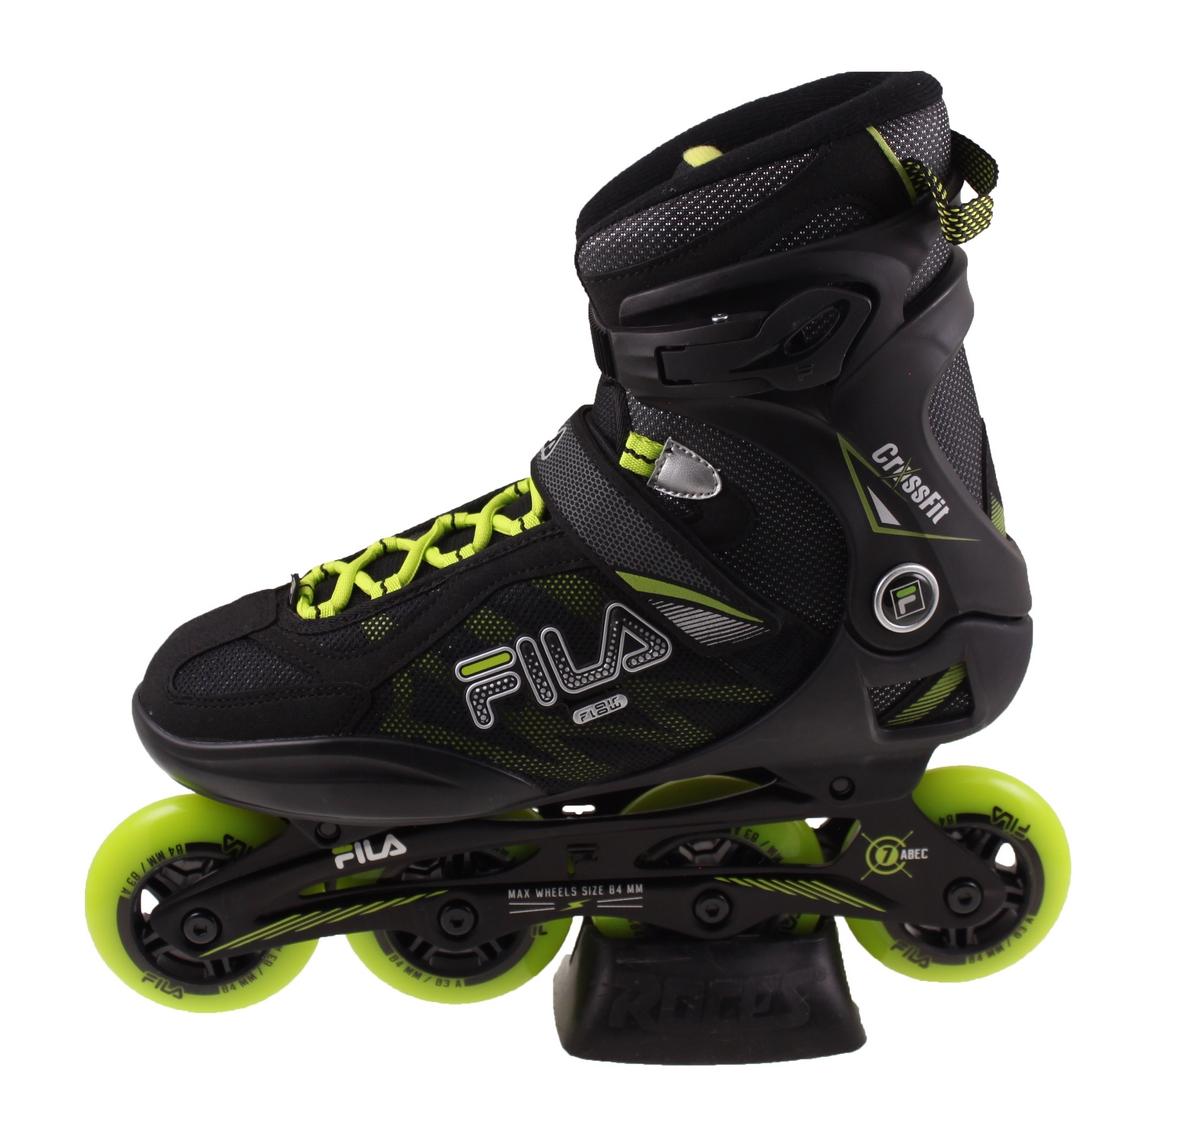 d71751b9c2b Fila Crossfit Men Inline Skate ZWART/GROEN online kopen bij Sportpaleis.